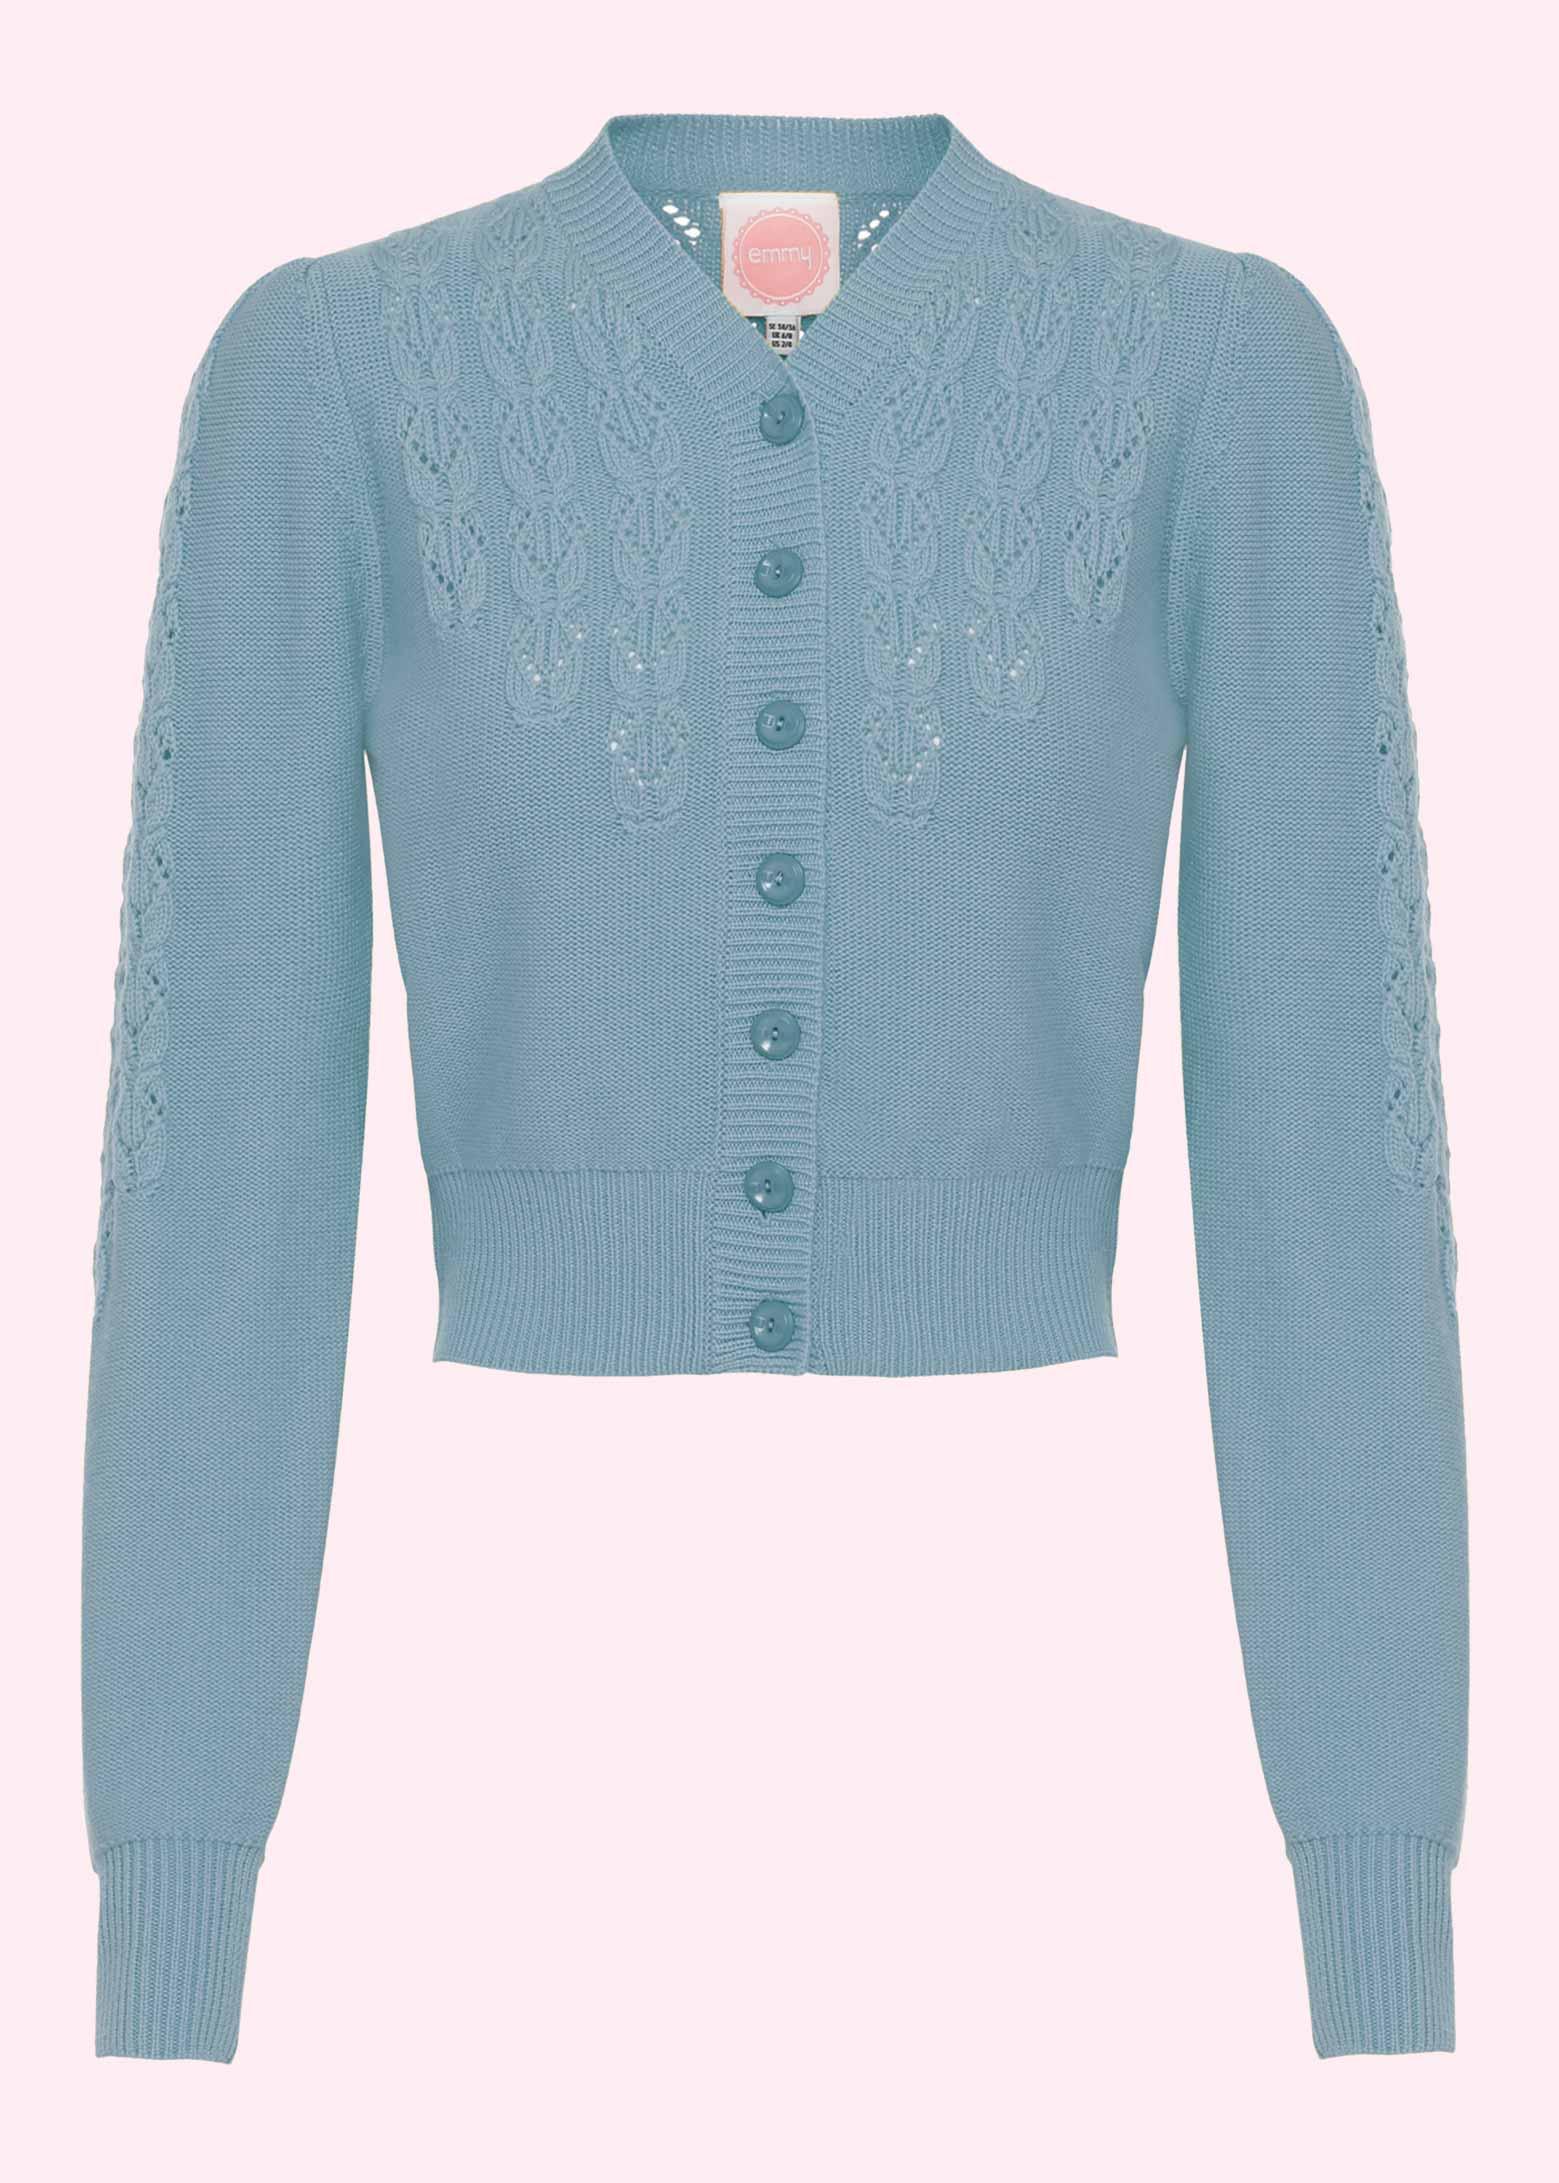 Waist cardigan in dusty blue from Emmy Design